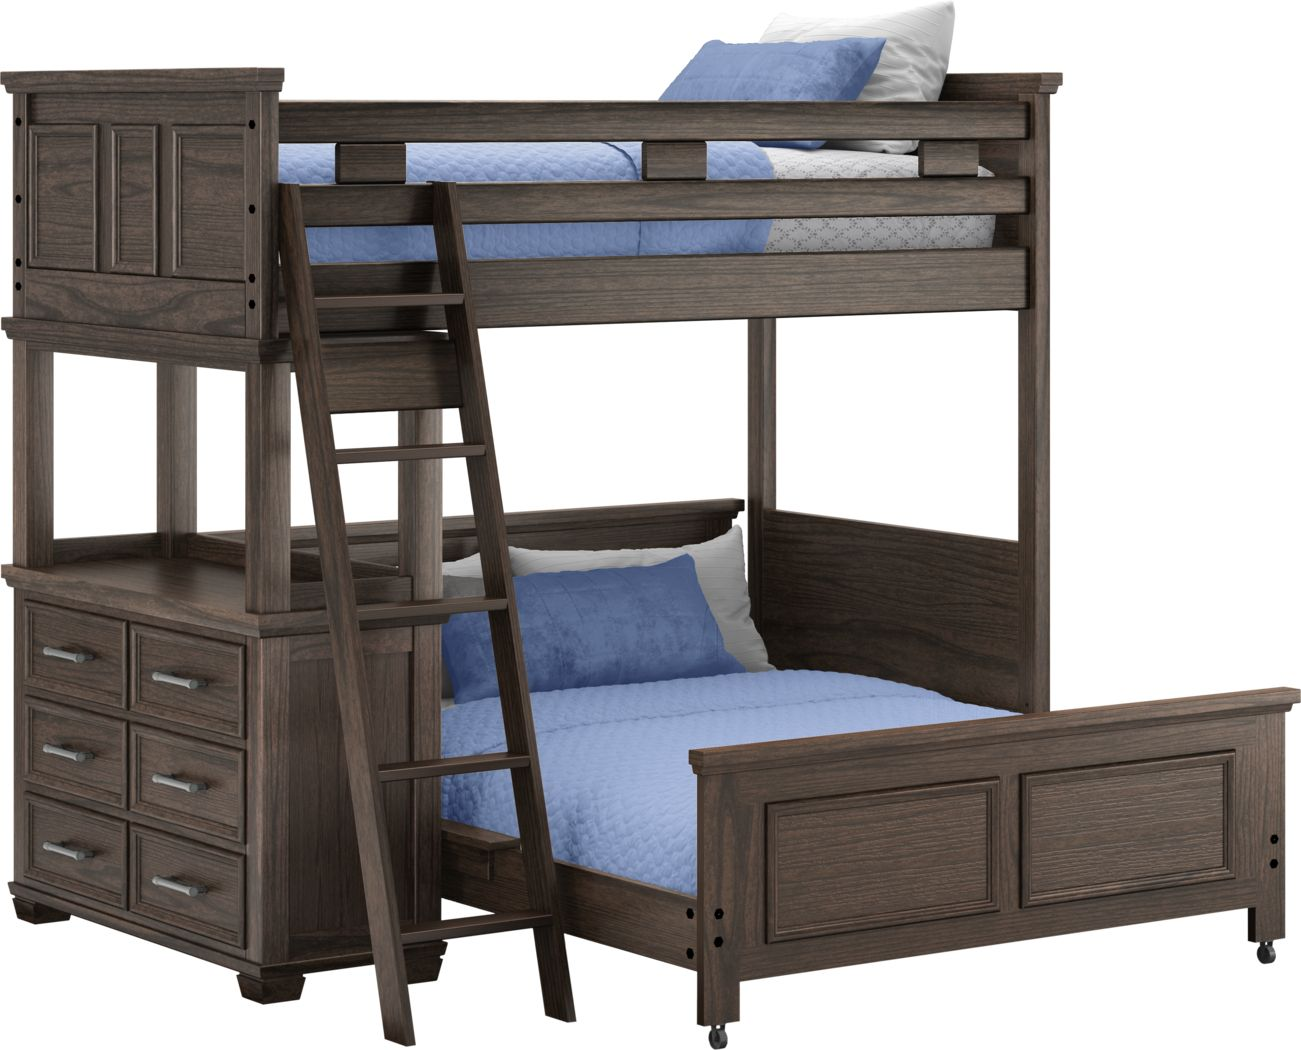 Canyon Lake Java Twin/Full Loft with Dresser